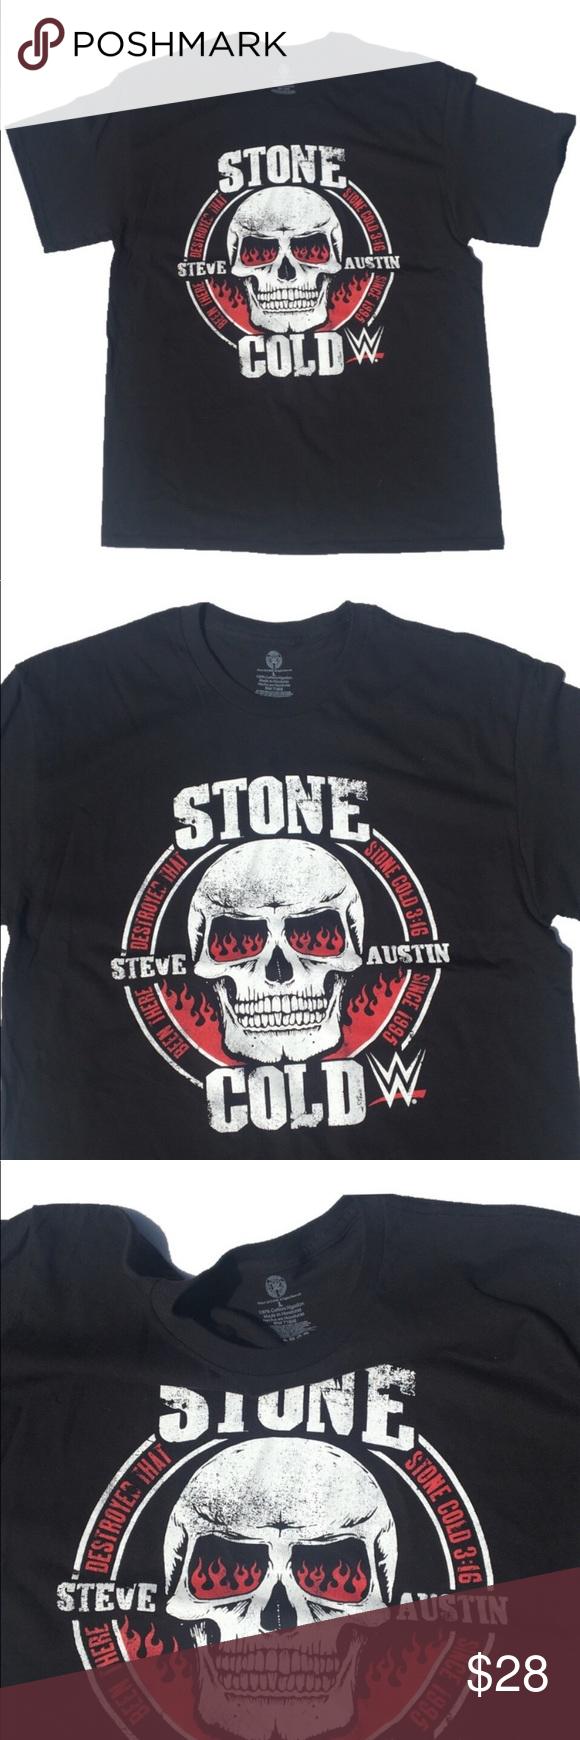 Wwe Stone Cold Steve Austin Shirt Super Cool Chest Logo Stone Cold Steve Austin Black T Shirt New Really Comfortable Austin Shirt Wwe Shirts Clothes Design